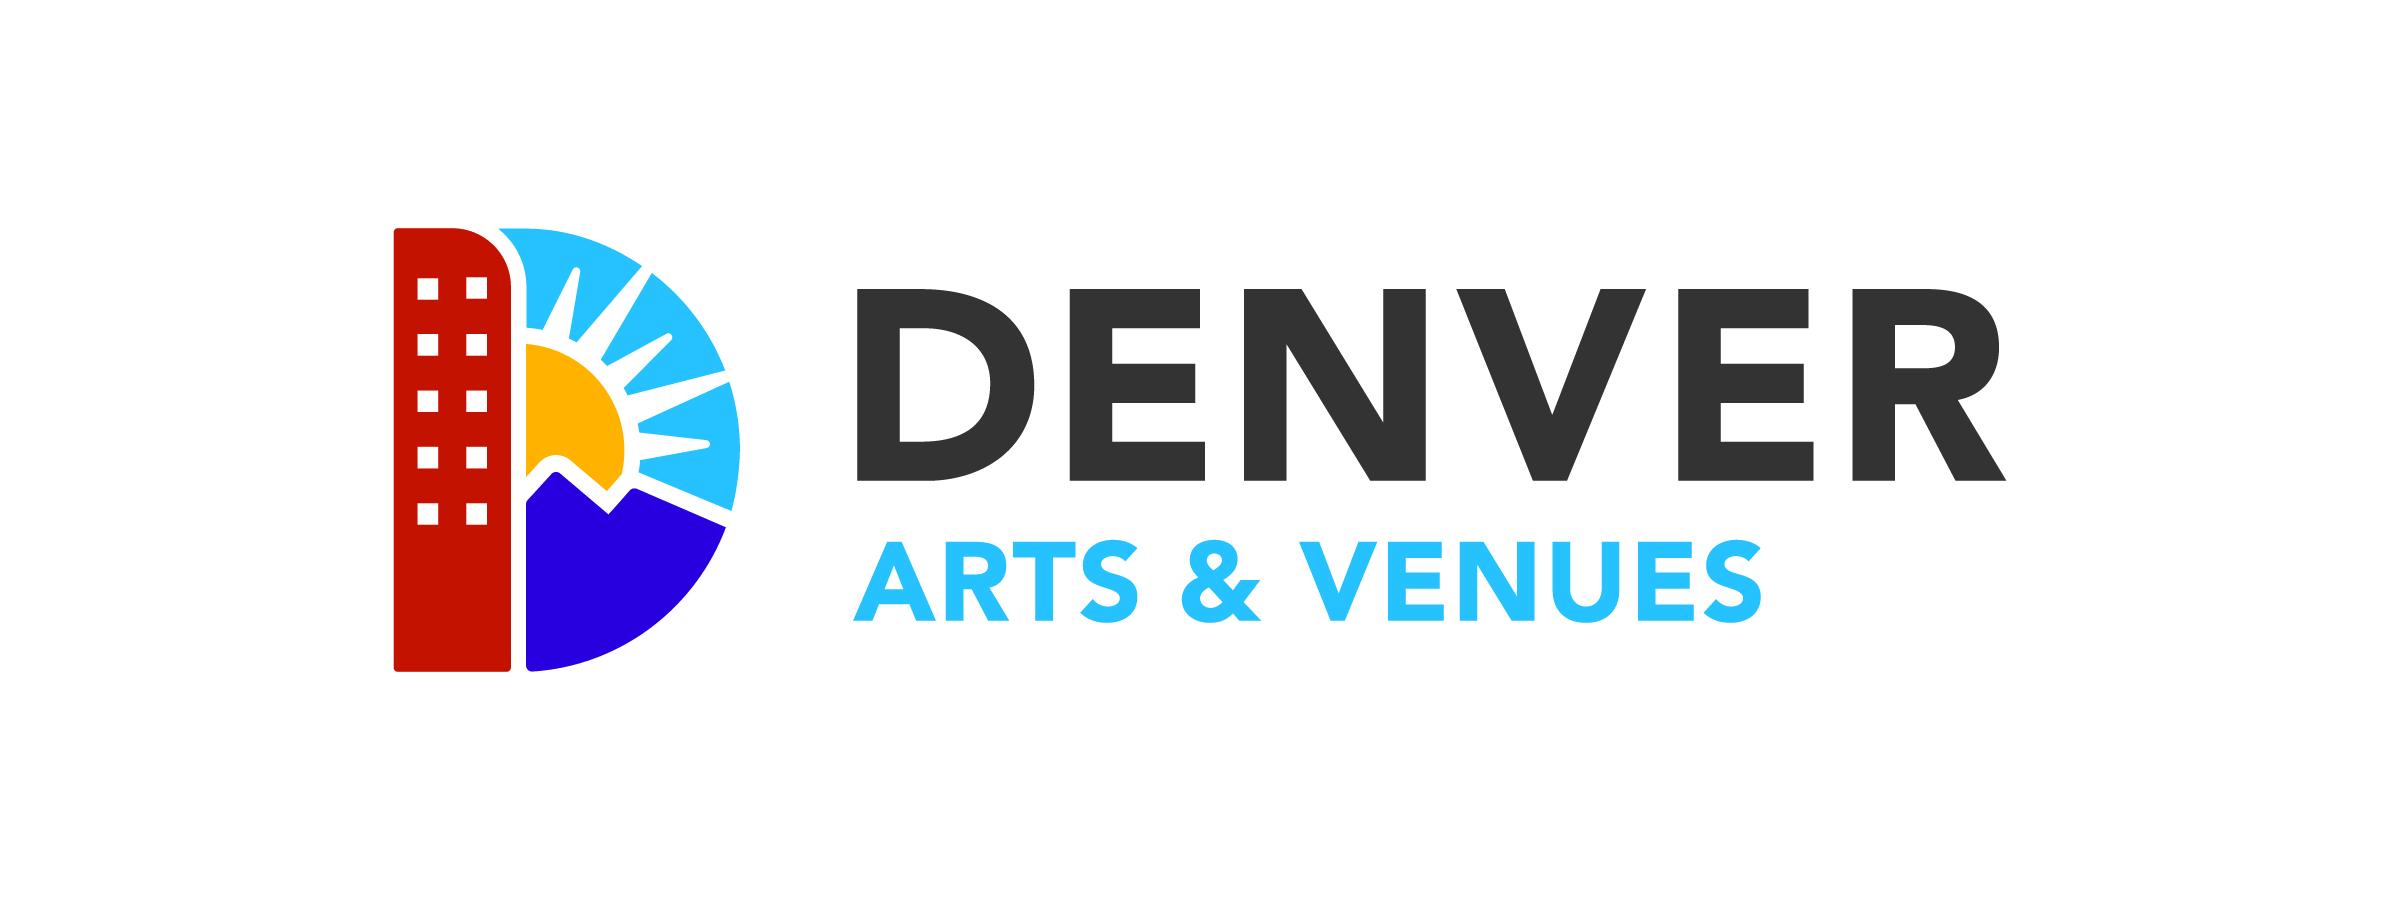 2_DenverArtsAndVenues_CMYK.jpg